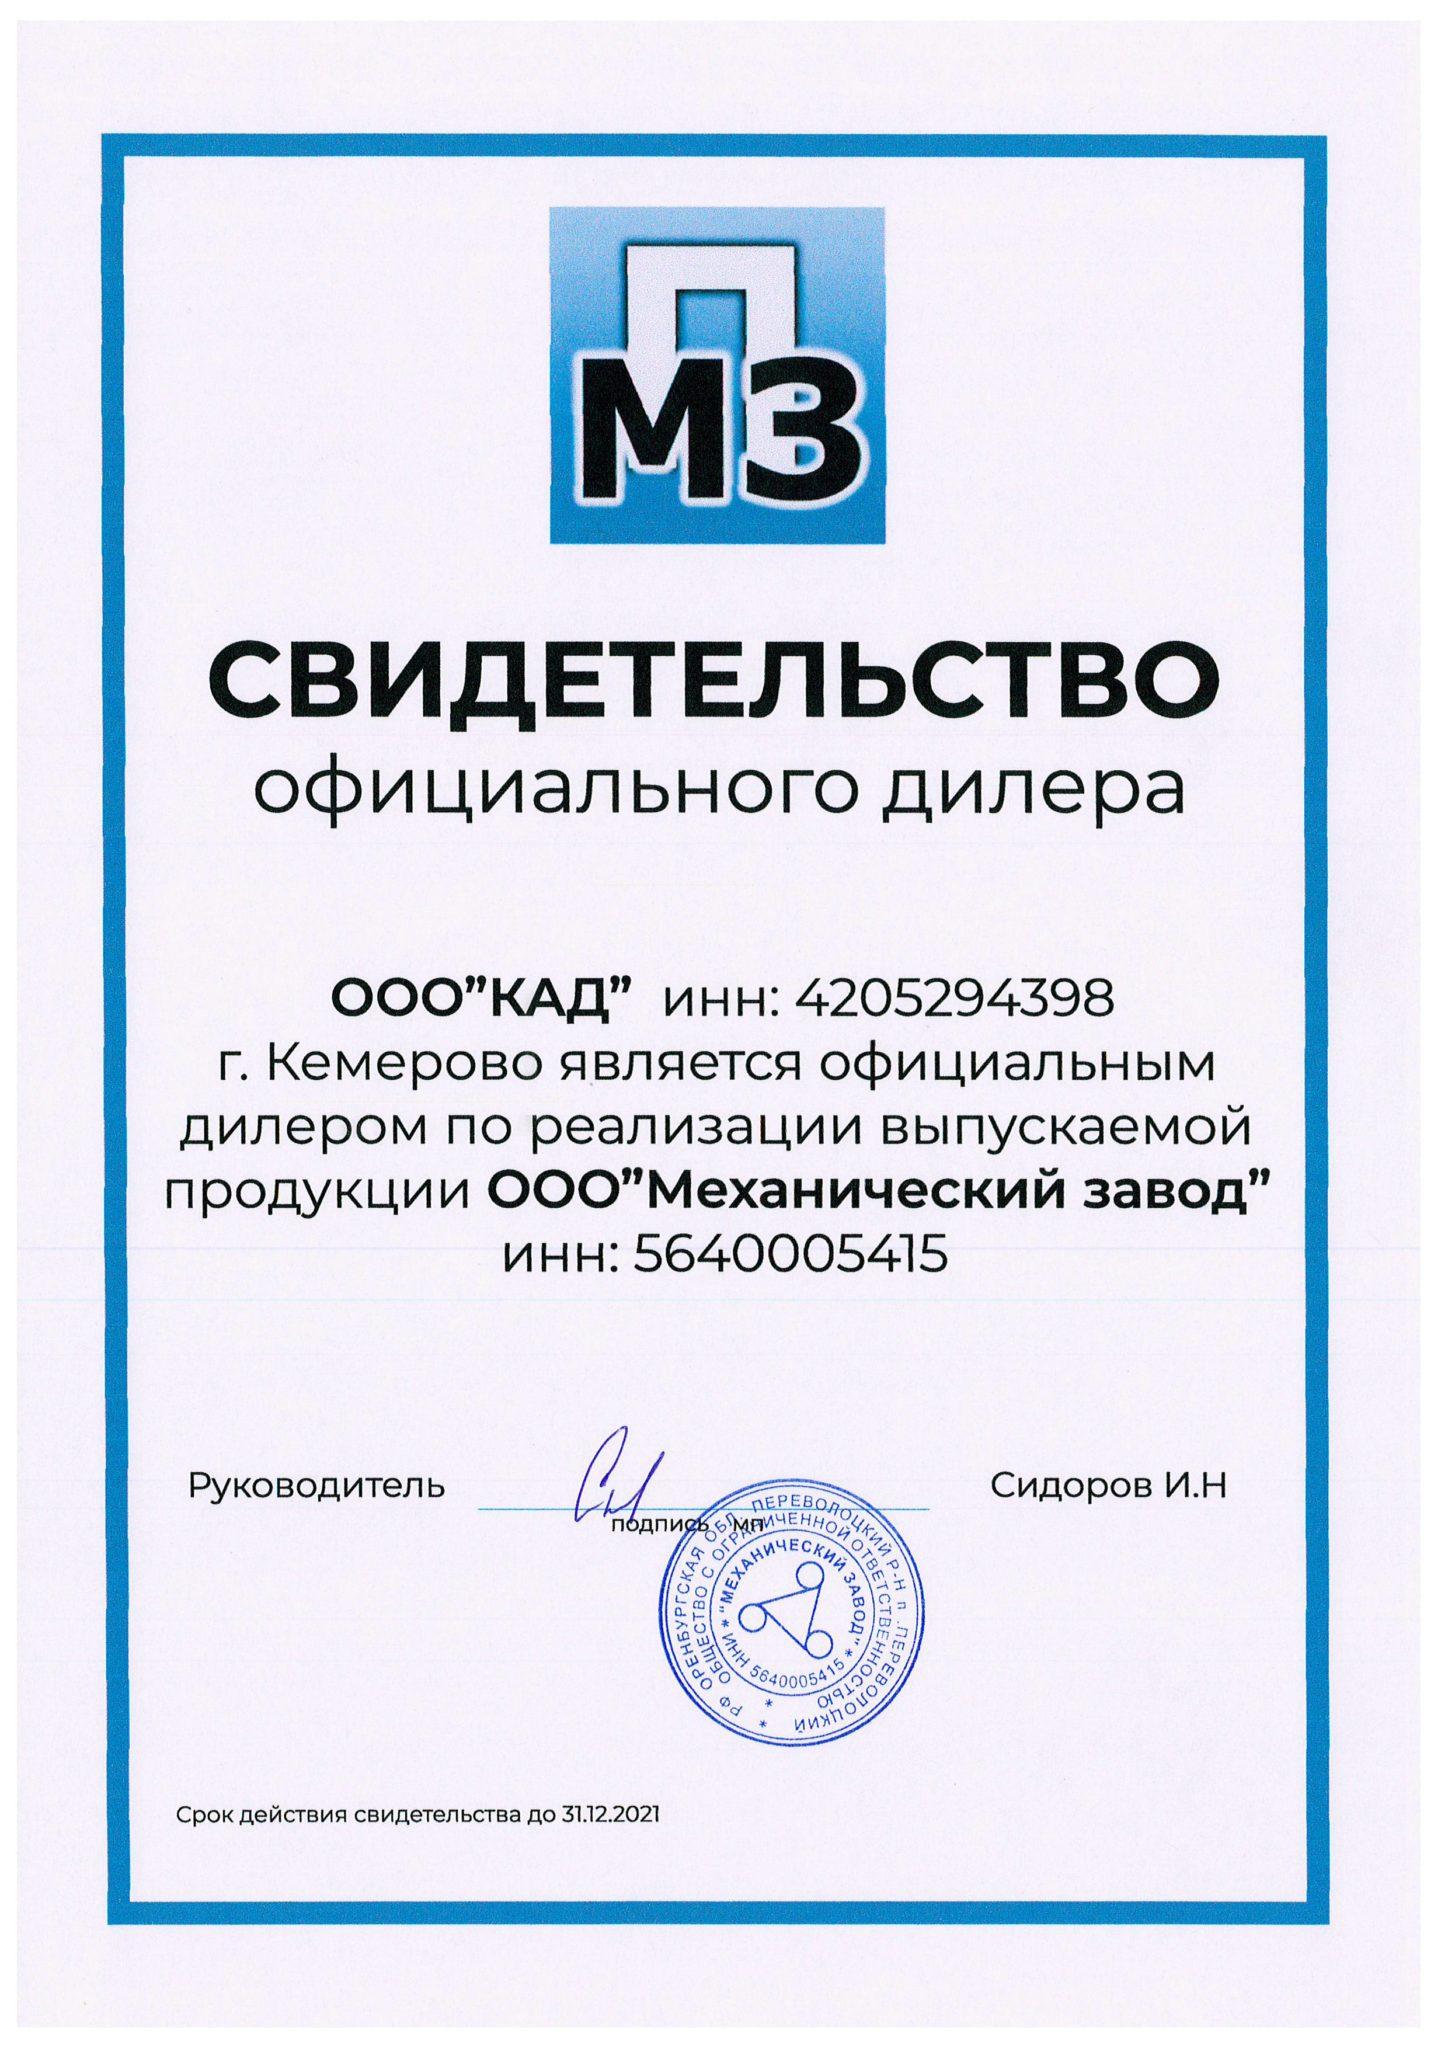 Сертификат МЗП 2020